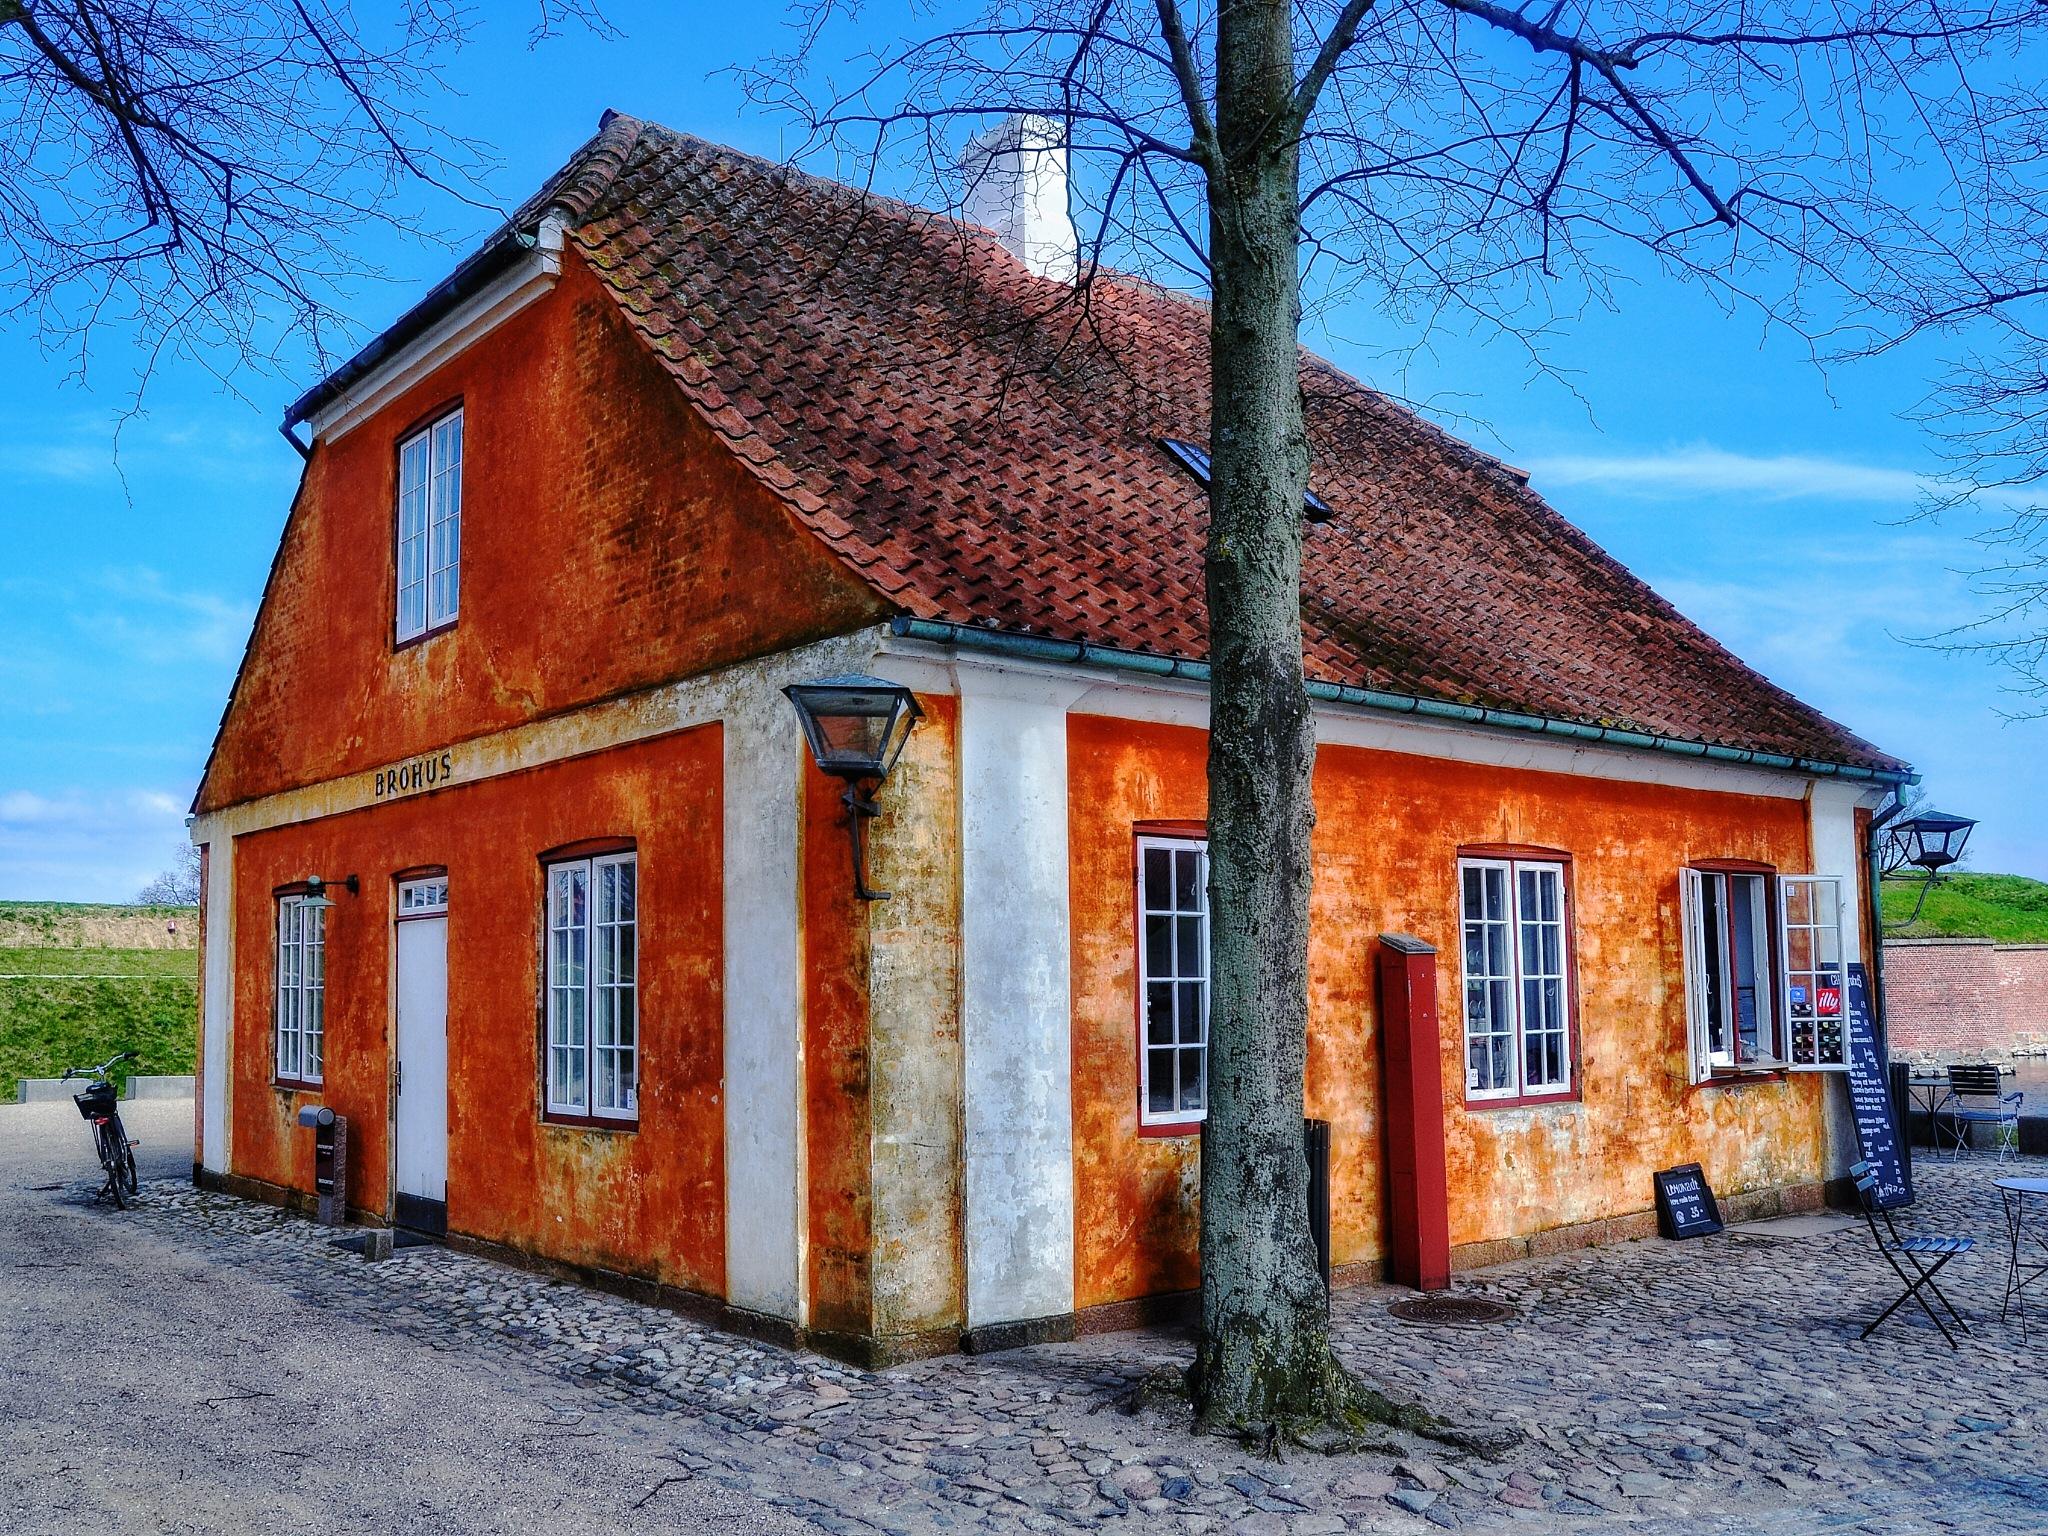 """Brohus"" att Kronborg Castle, Helsingør by Christian Jerhov"